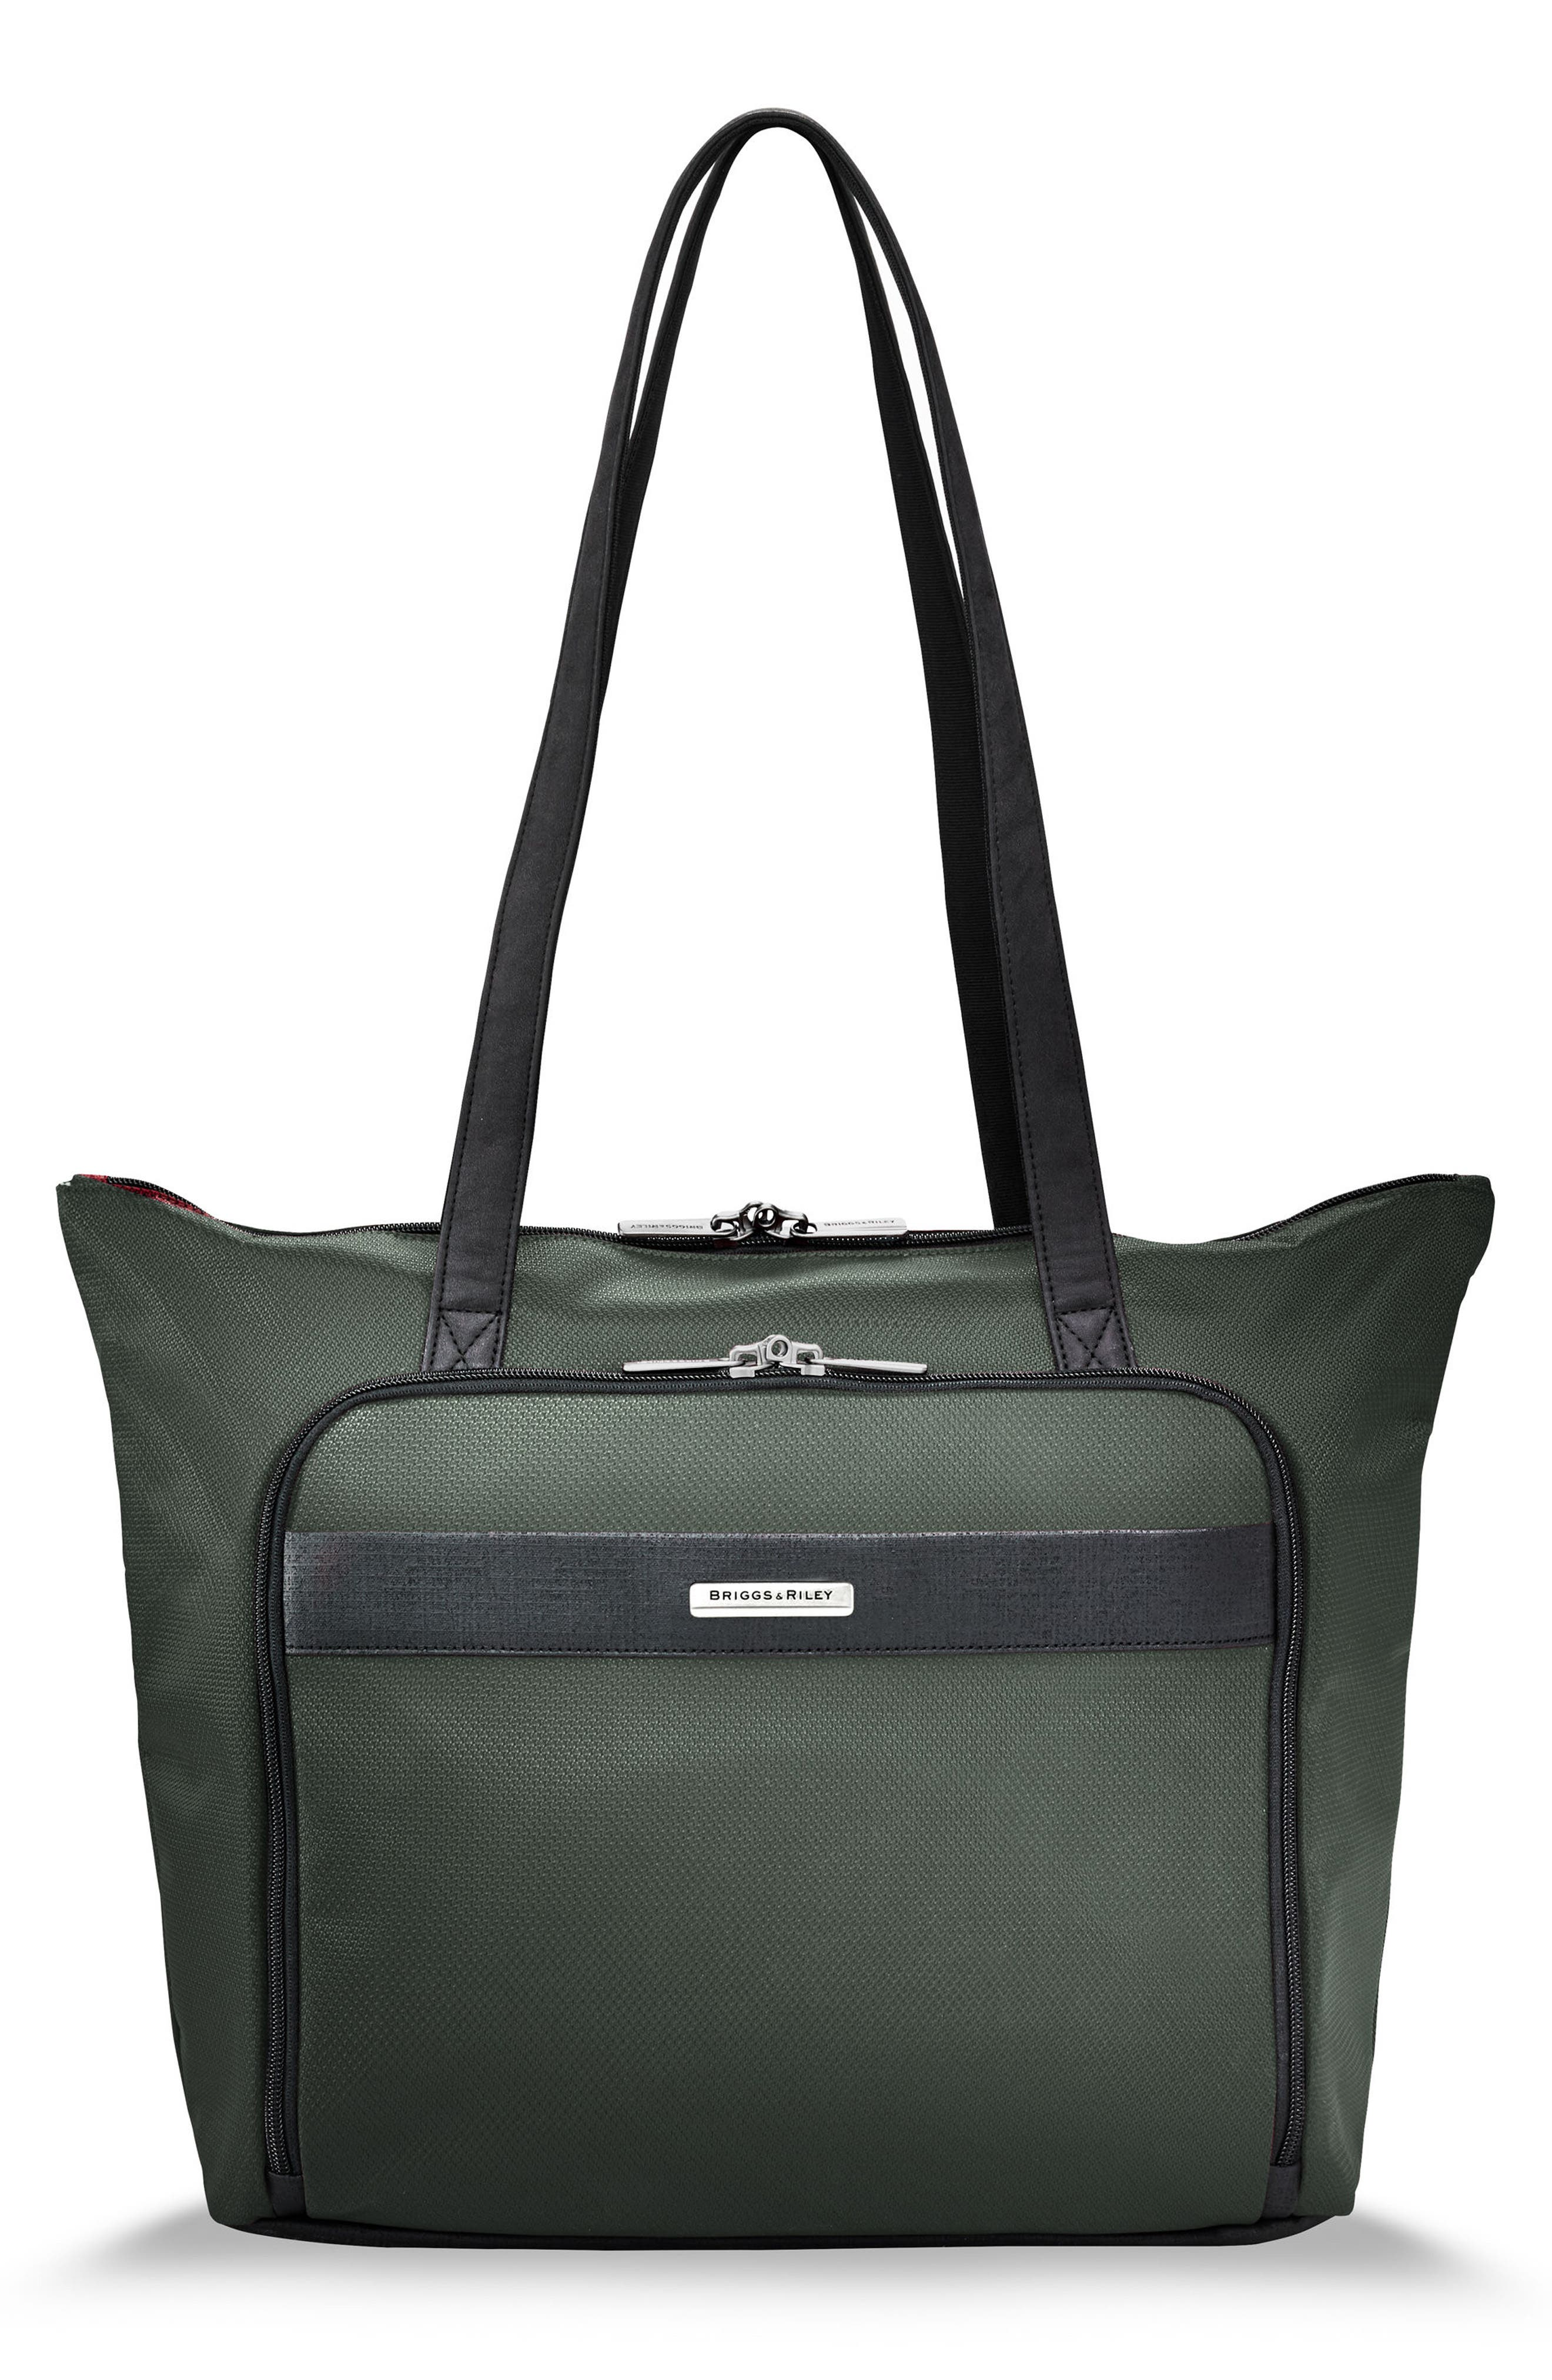 Transcend 400 Tote Bag,                             Main thumbnail 1, color,                             Rainforest Green